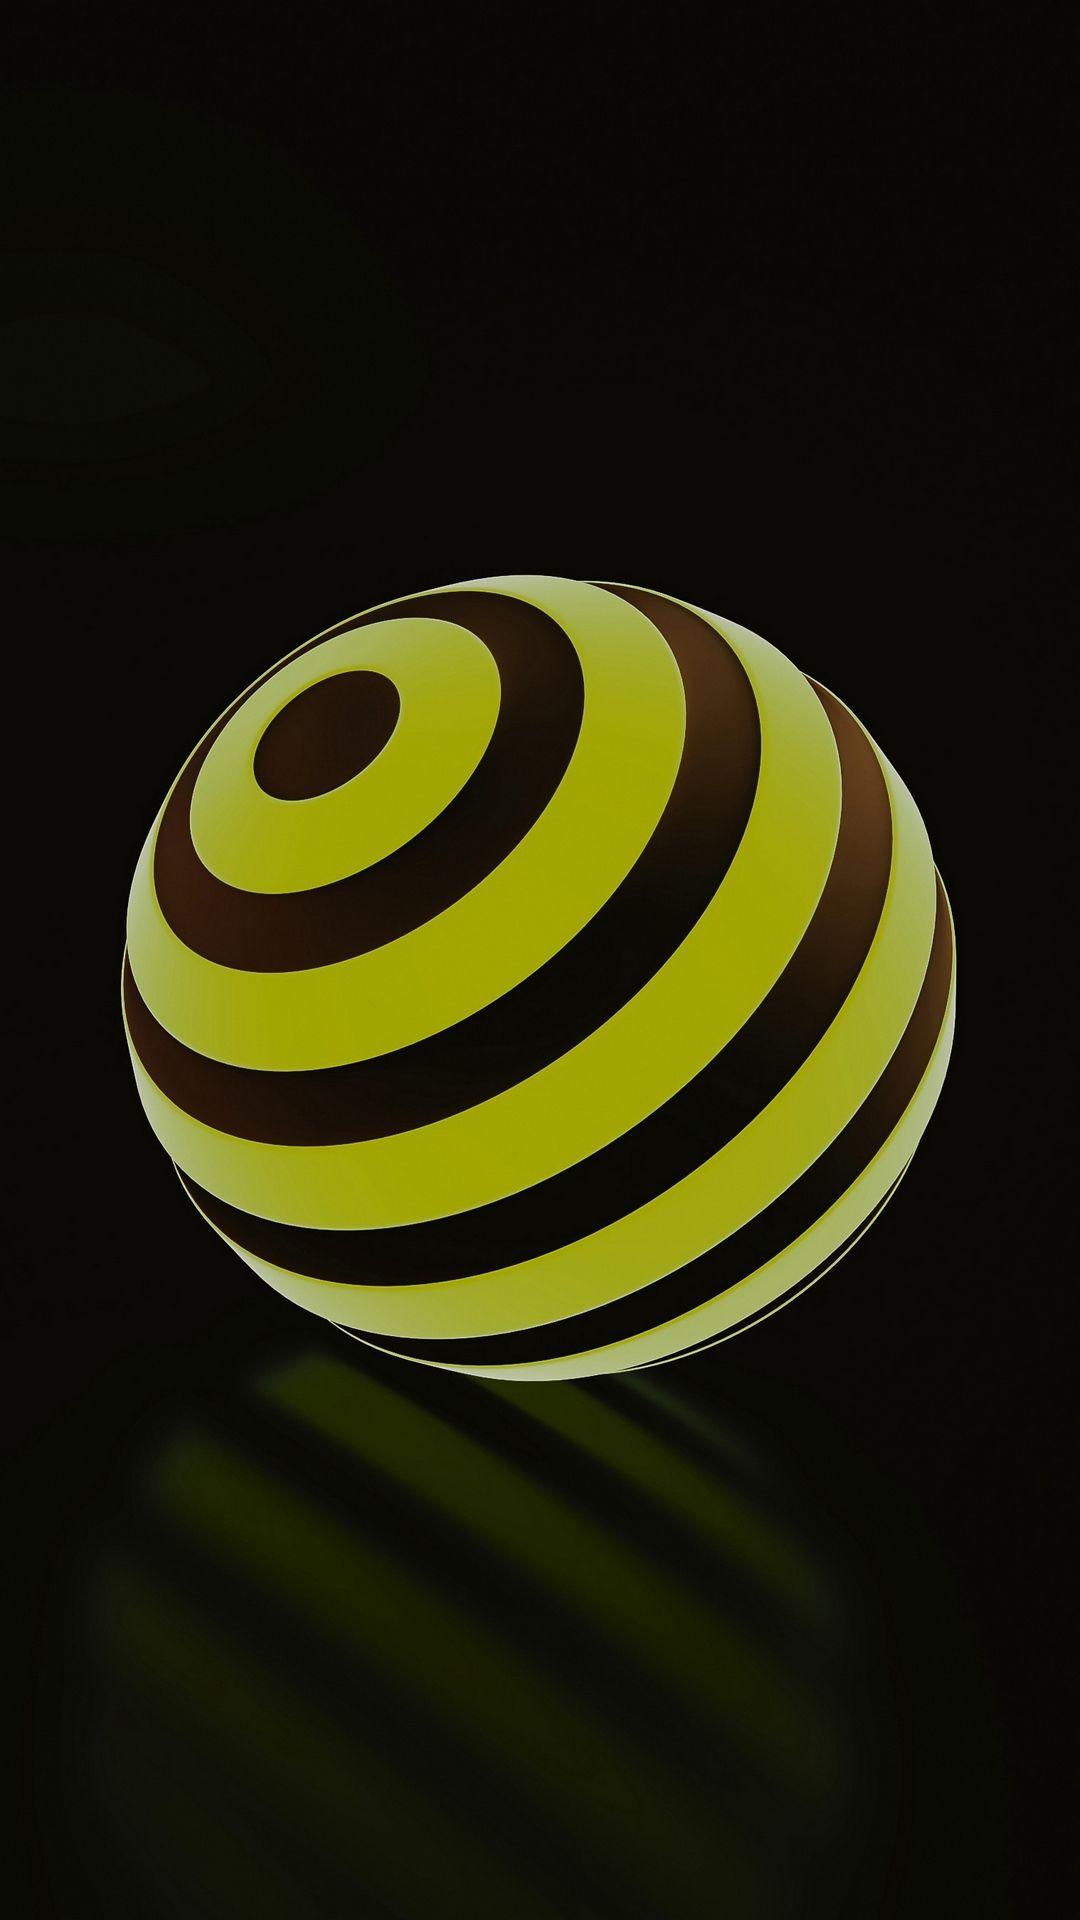 3D Balls Colorful Ball Hd Wallpaper